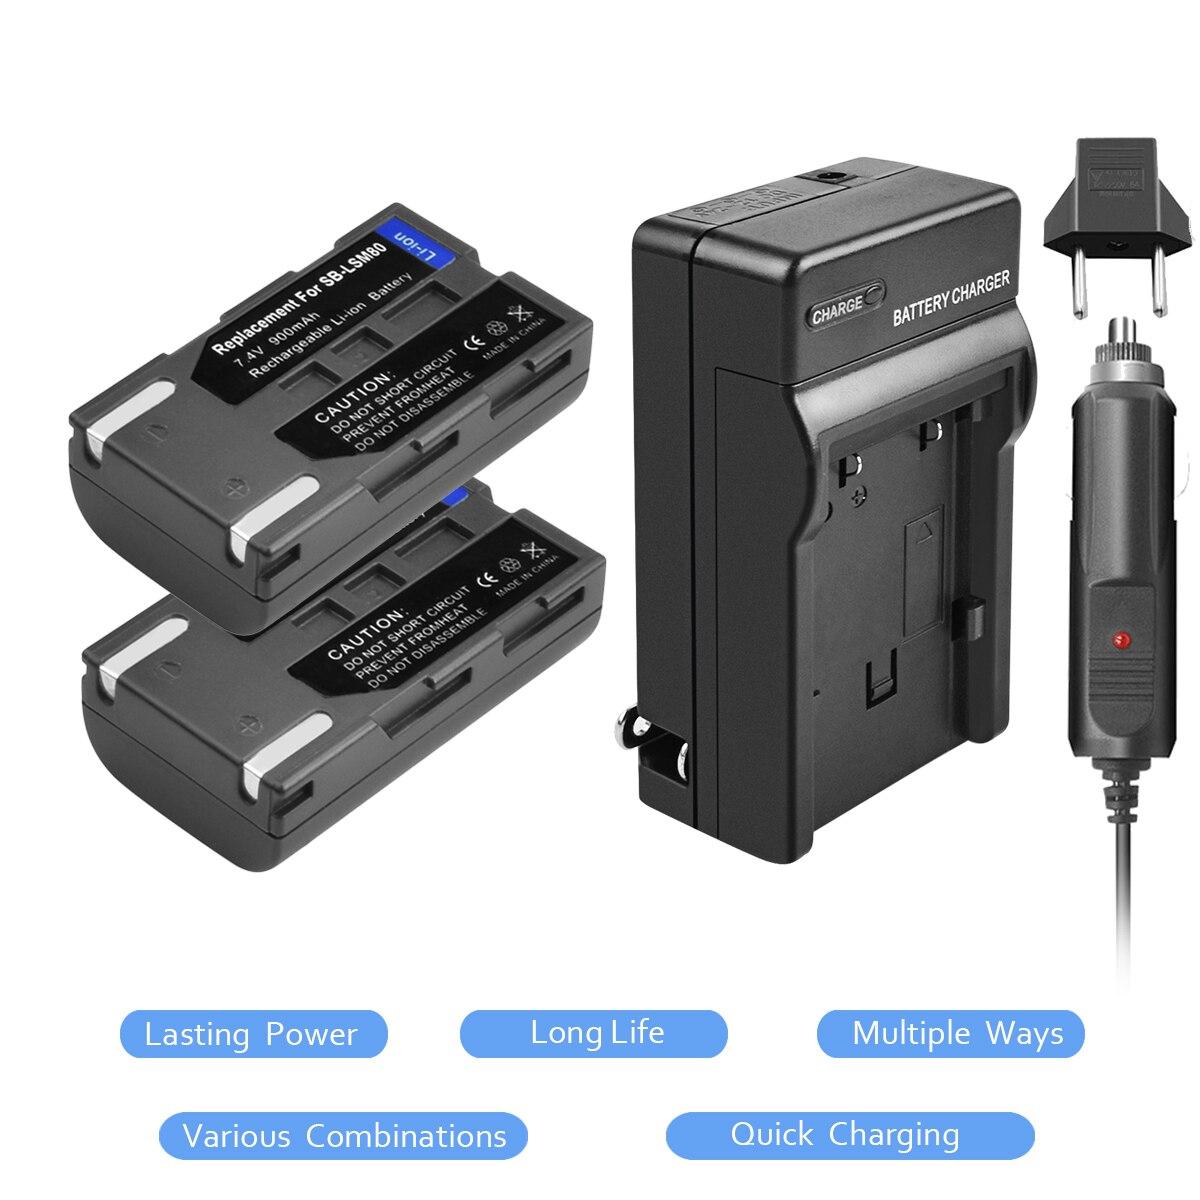 2X SB-LSM80 SB LSM80 Rechargeable Li-ion Battery+Battery Charger For SAMSUNG VP-DC175 VP-DC565 VP-DC575 SC-D357 L20